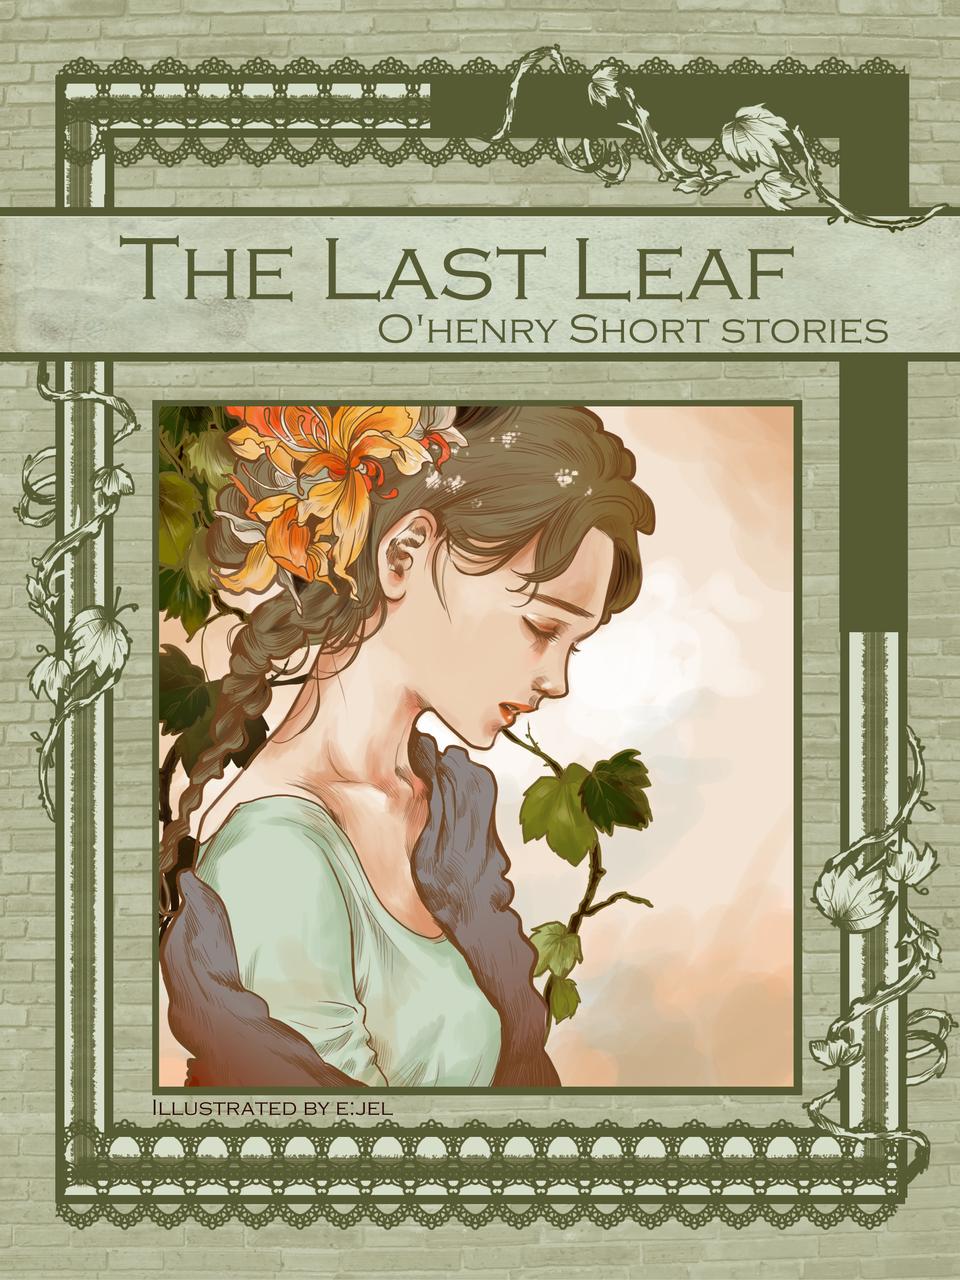 the last leaf story